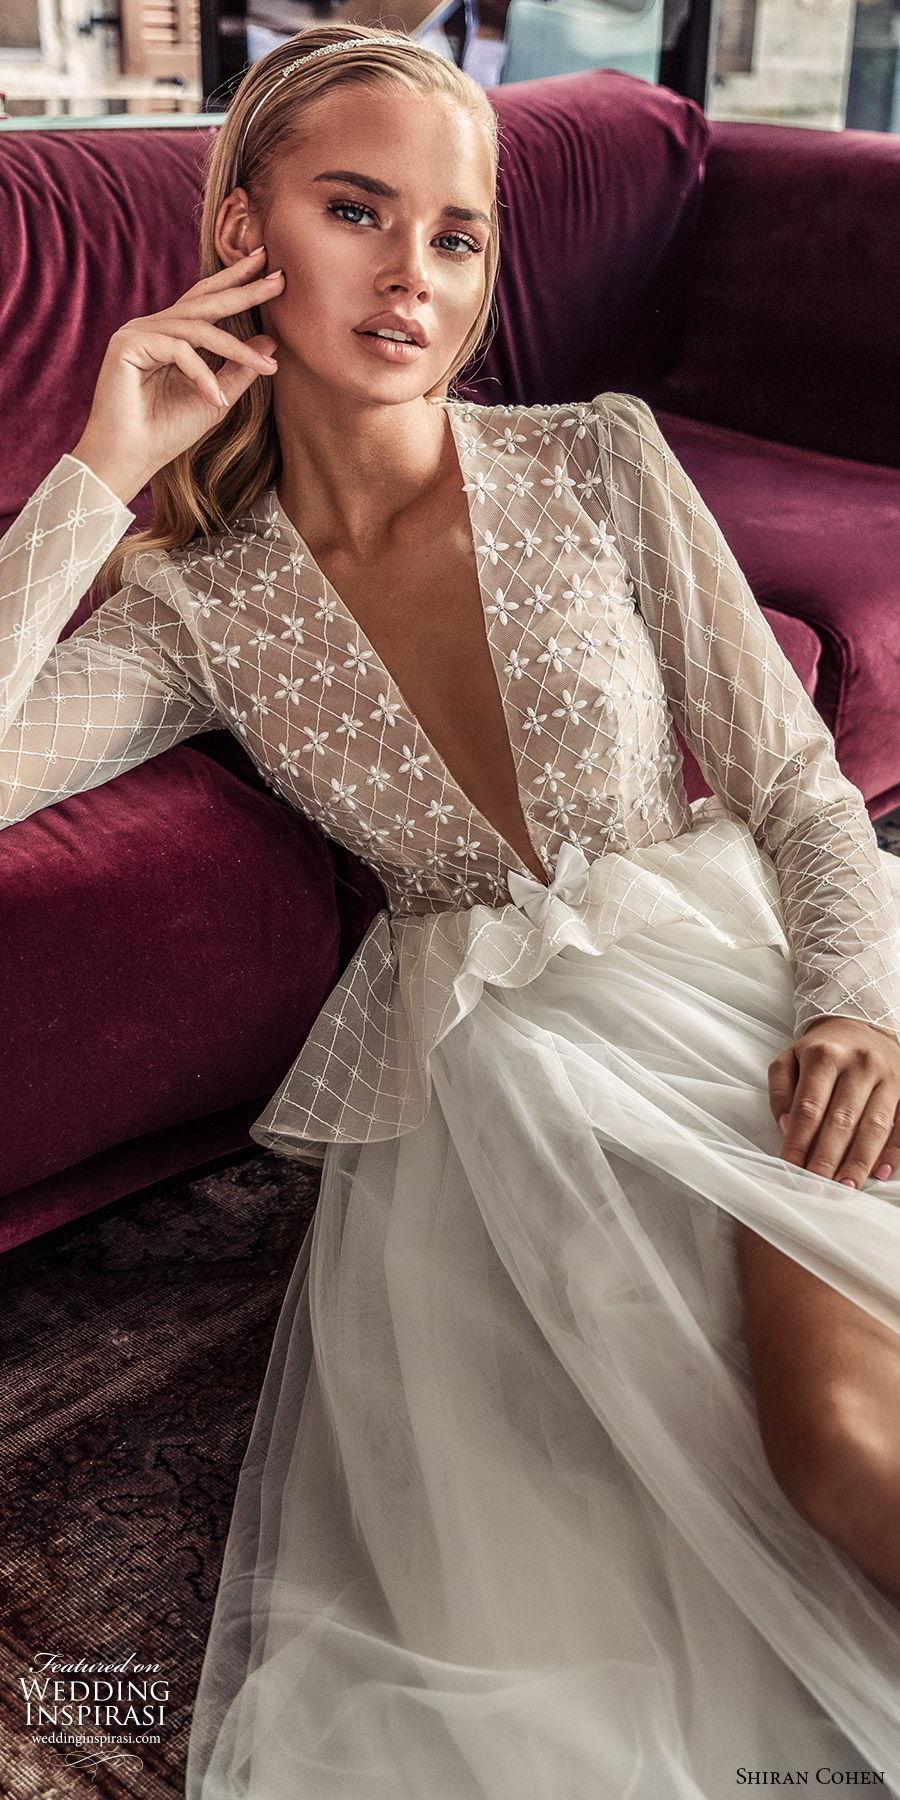 shiran cohen 2019 bridal illusion long sleeves plunging v neckline embellished bodice peplum a line wedding dress ruffle skirt romantic  (10) zv